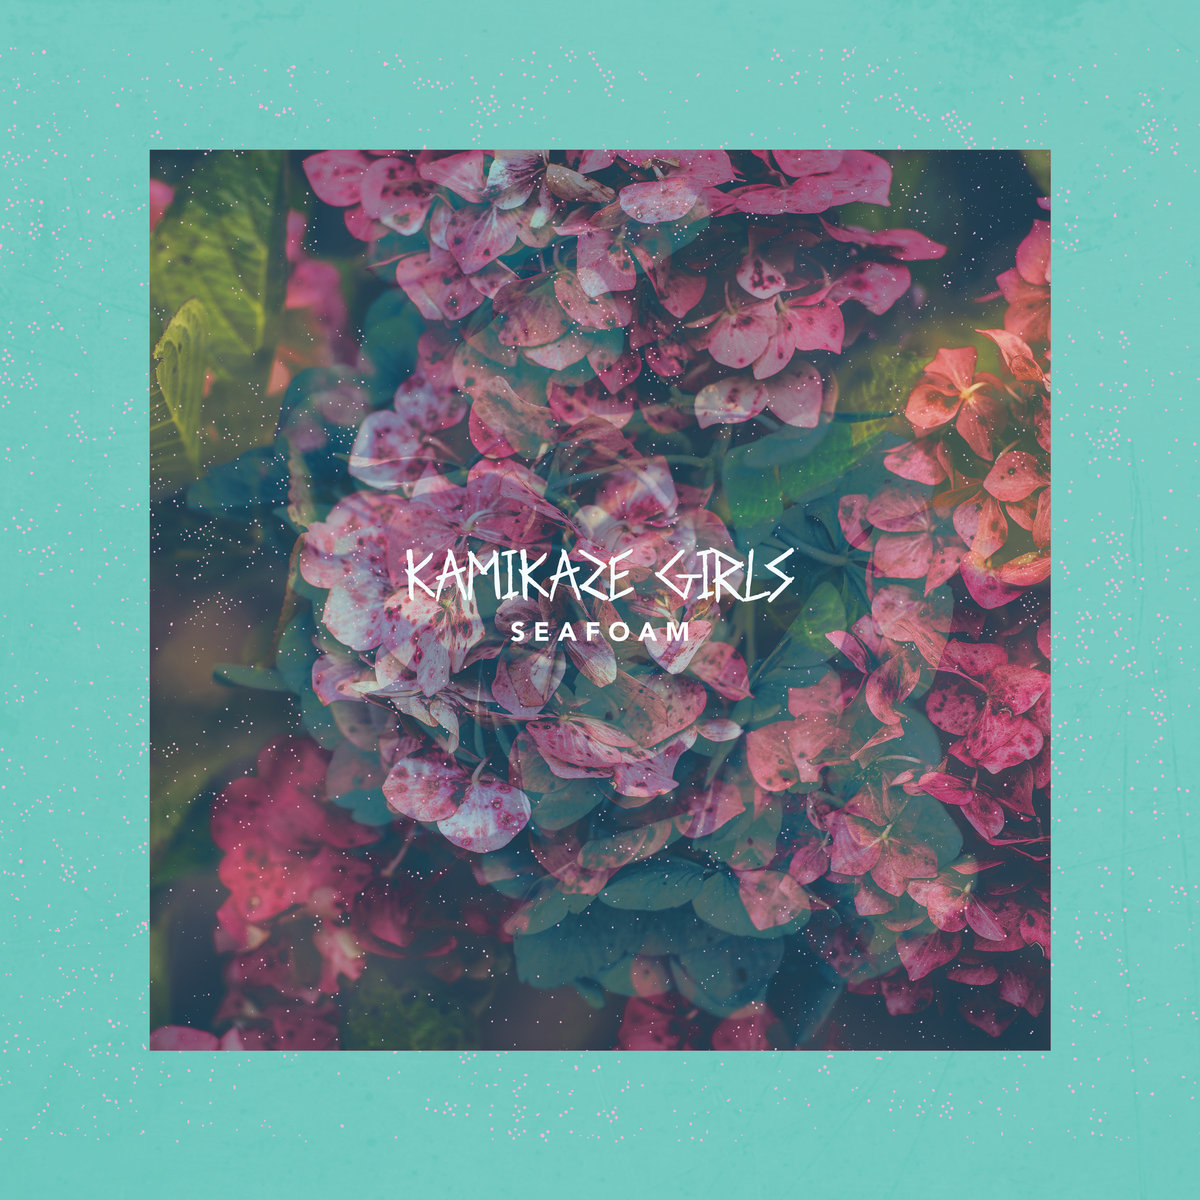 Kamikaze Girls - Seafoam LP